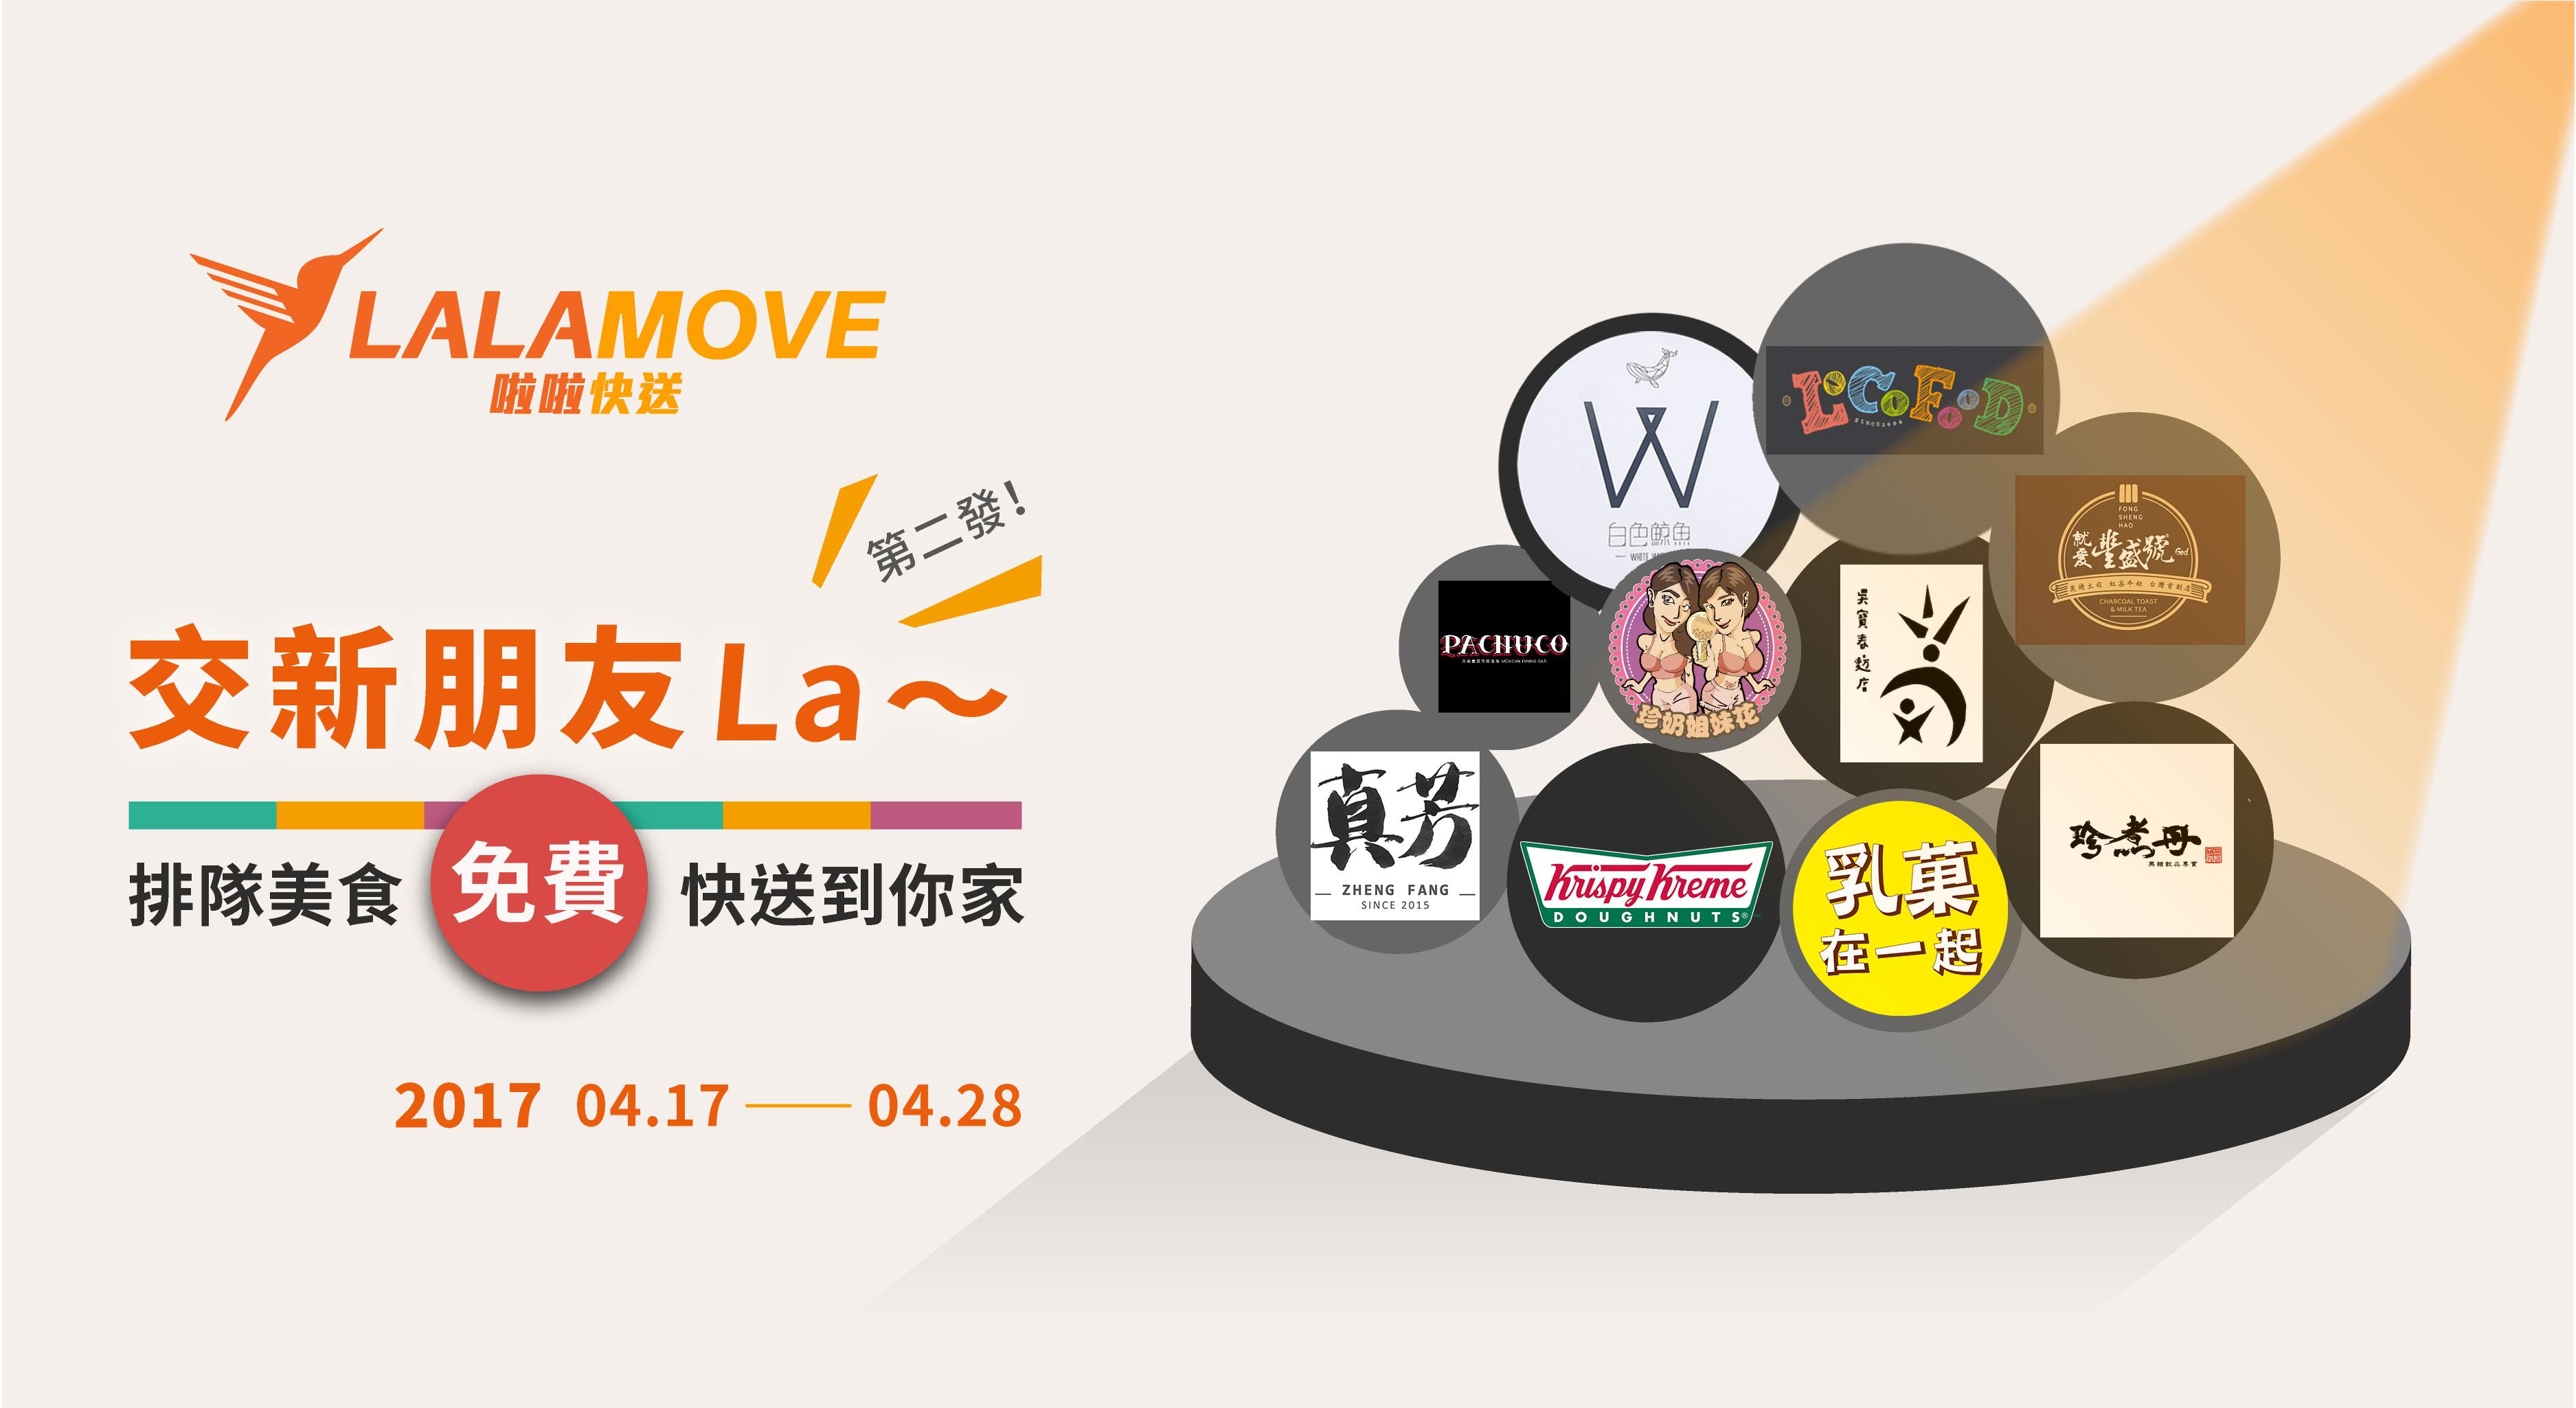 Lalamove【交新朋友La~ 第二發】排隊美食免排隊,快送到手免運費!